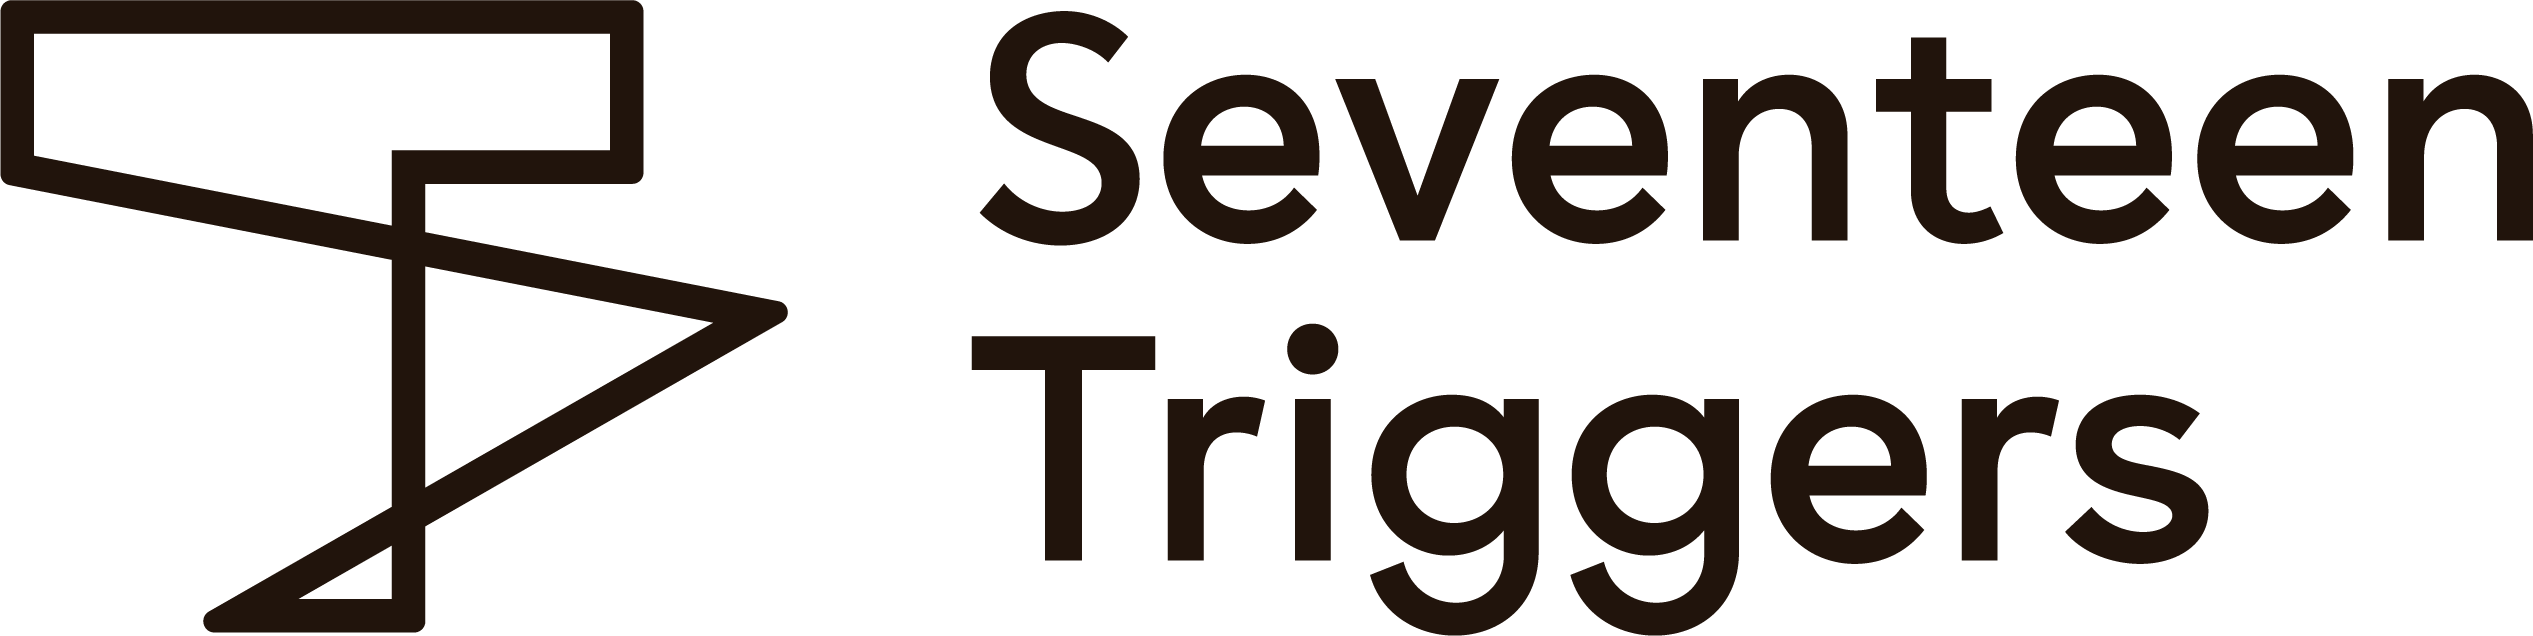 17 Triggers